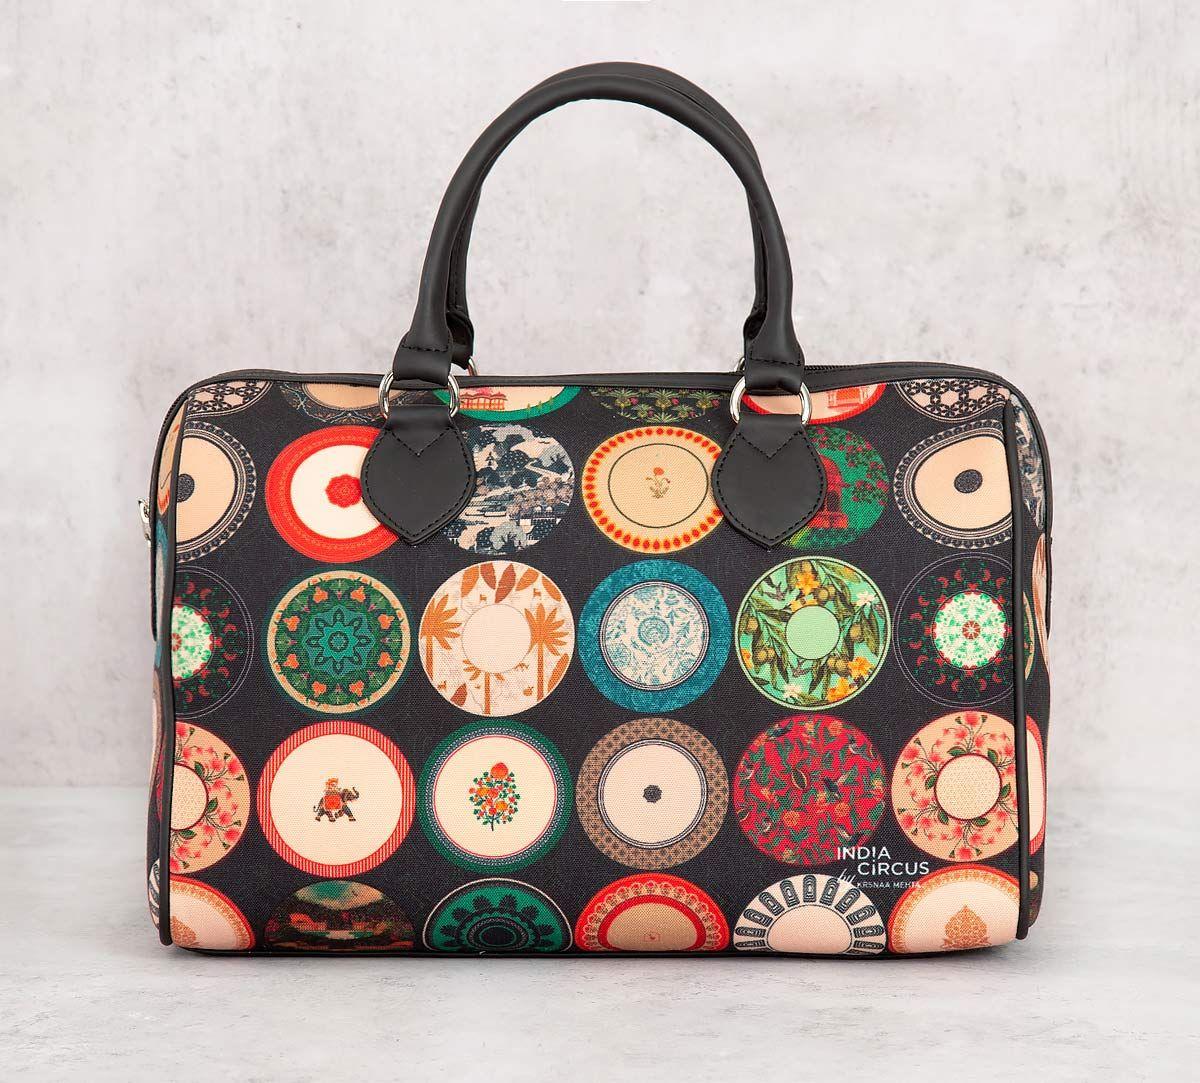 India Circus Platter Portrayal Duffle Bag